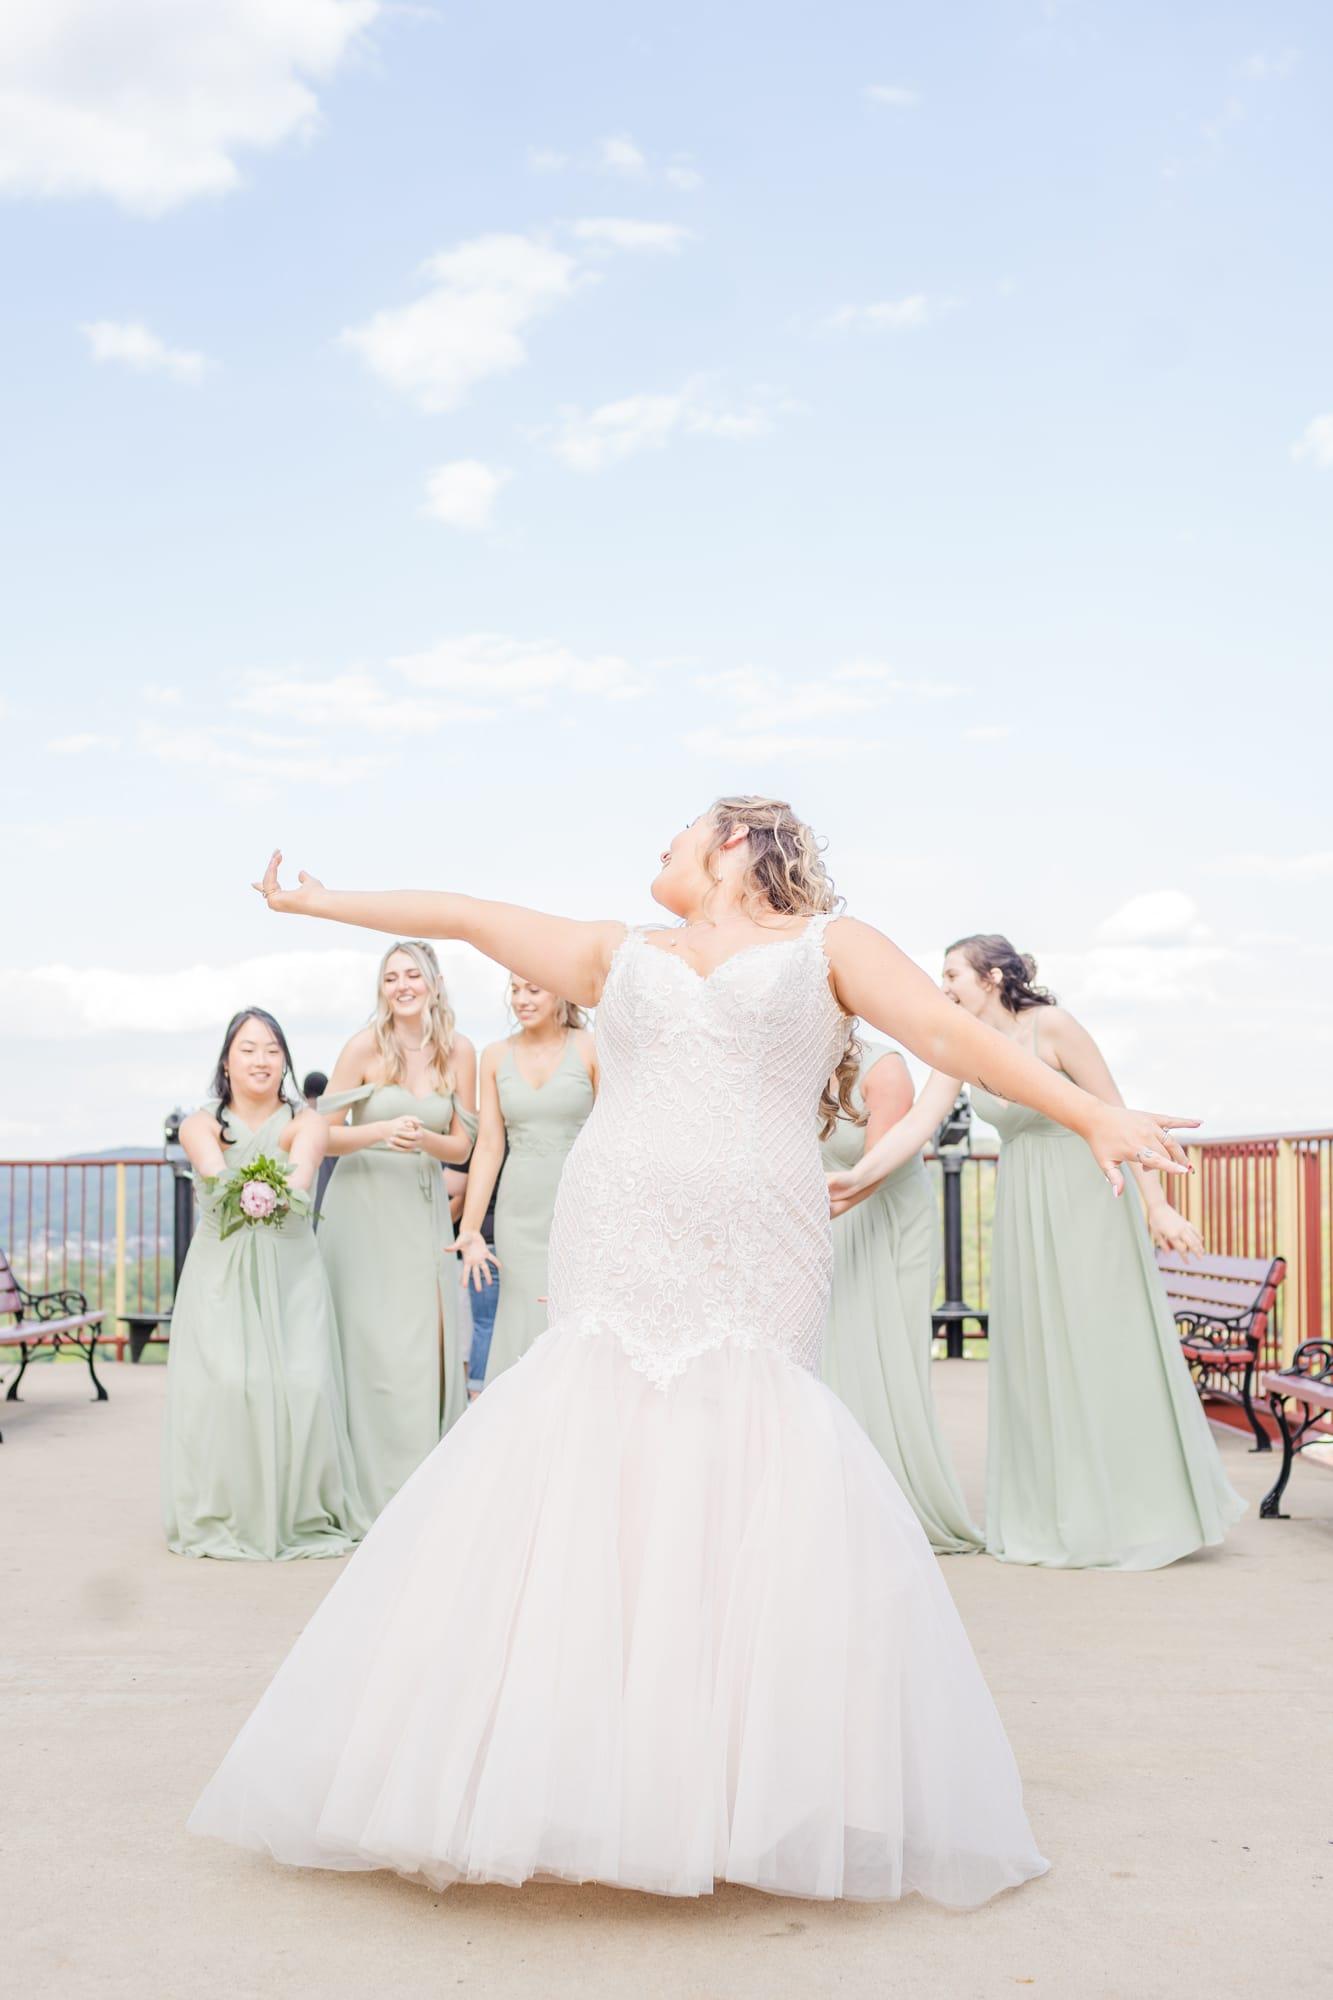 Central Pennsylvania PA summer wedding reception bouquet toss